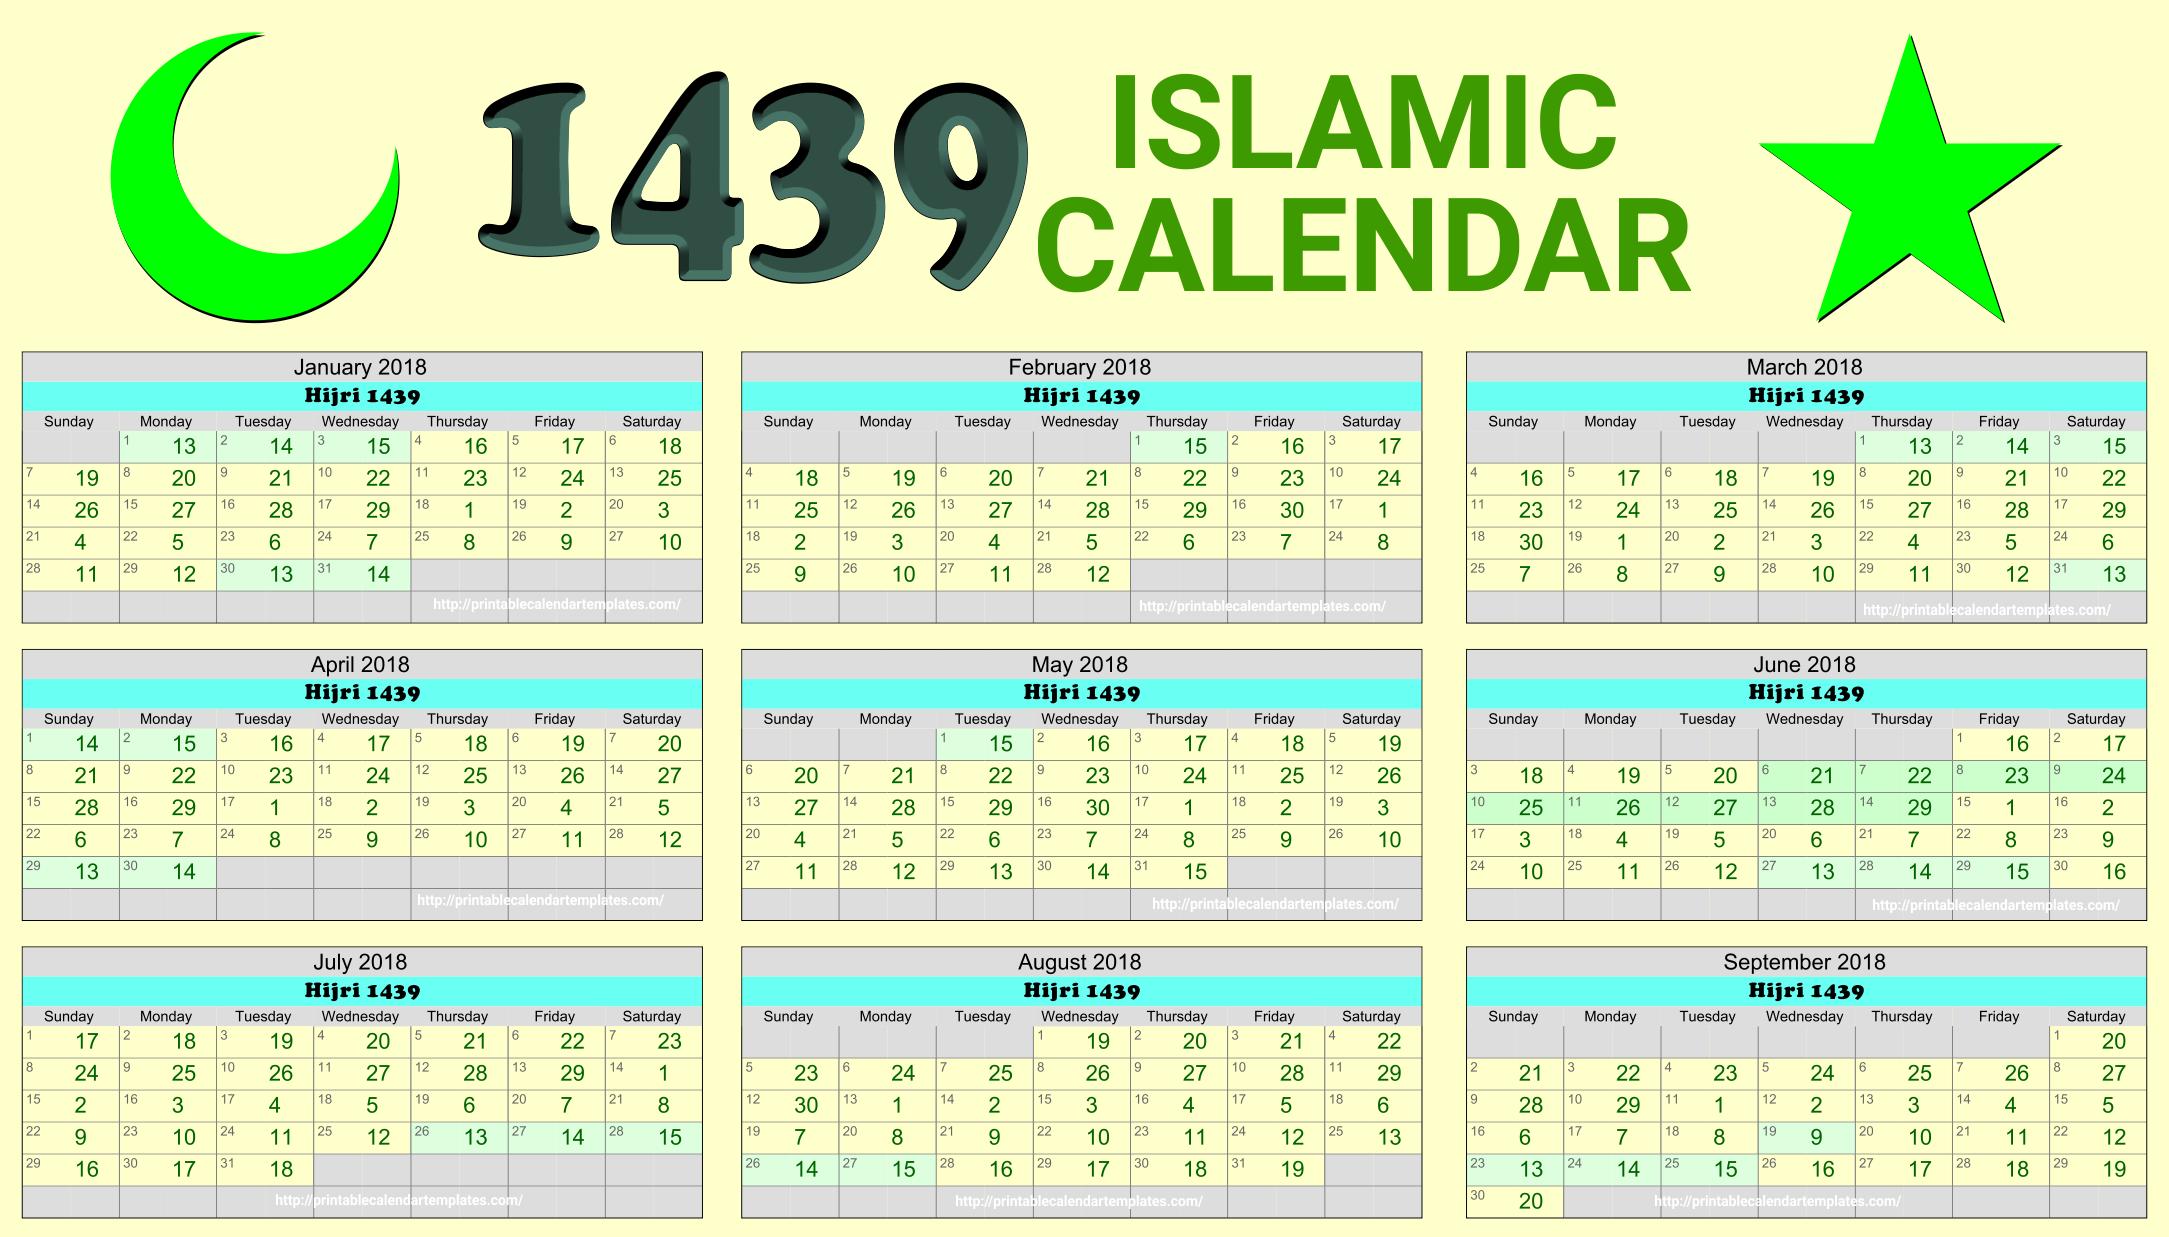 Islamic calendar 2018 | Hijri Calendar 1439 | Free Printable